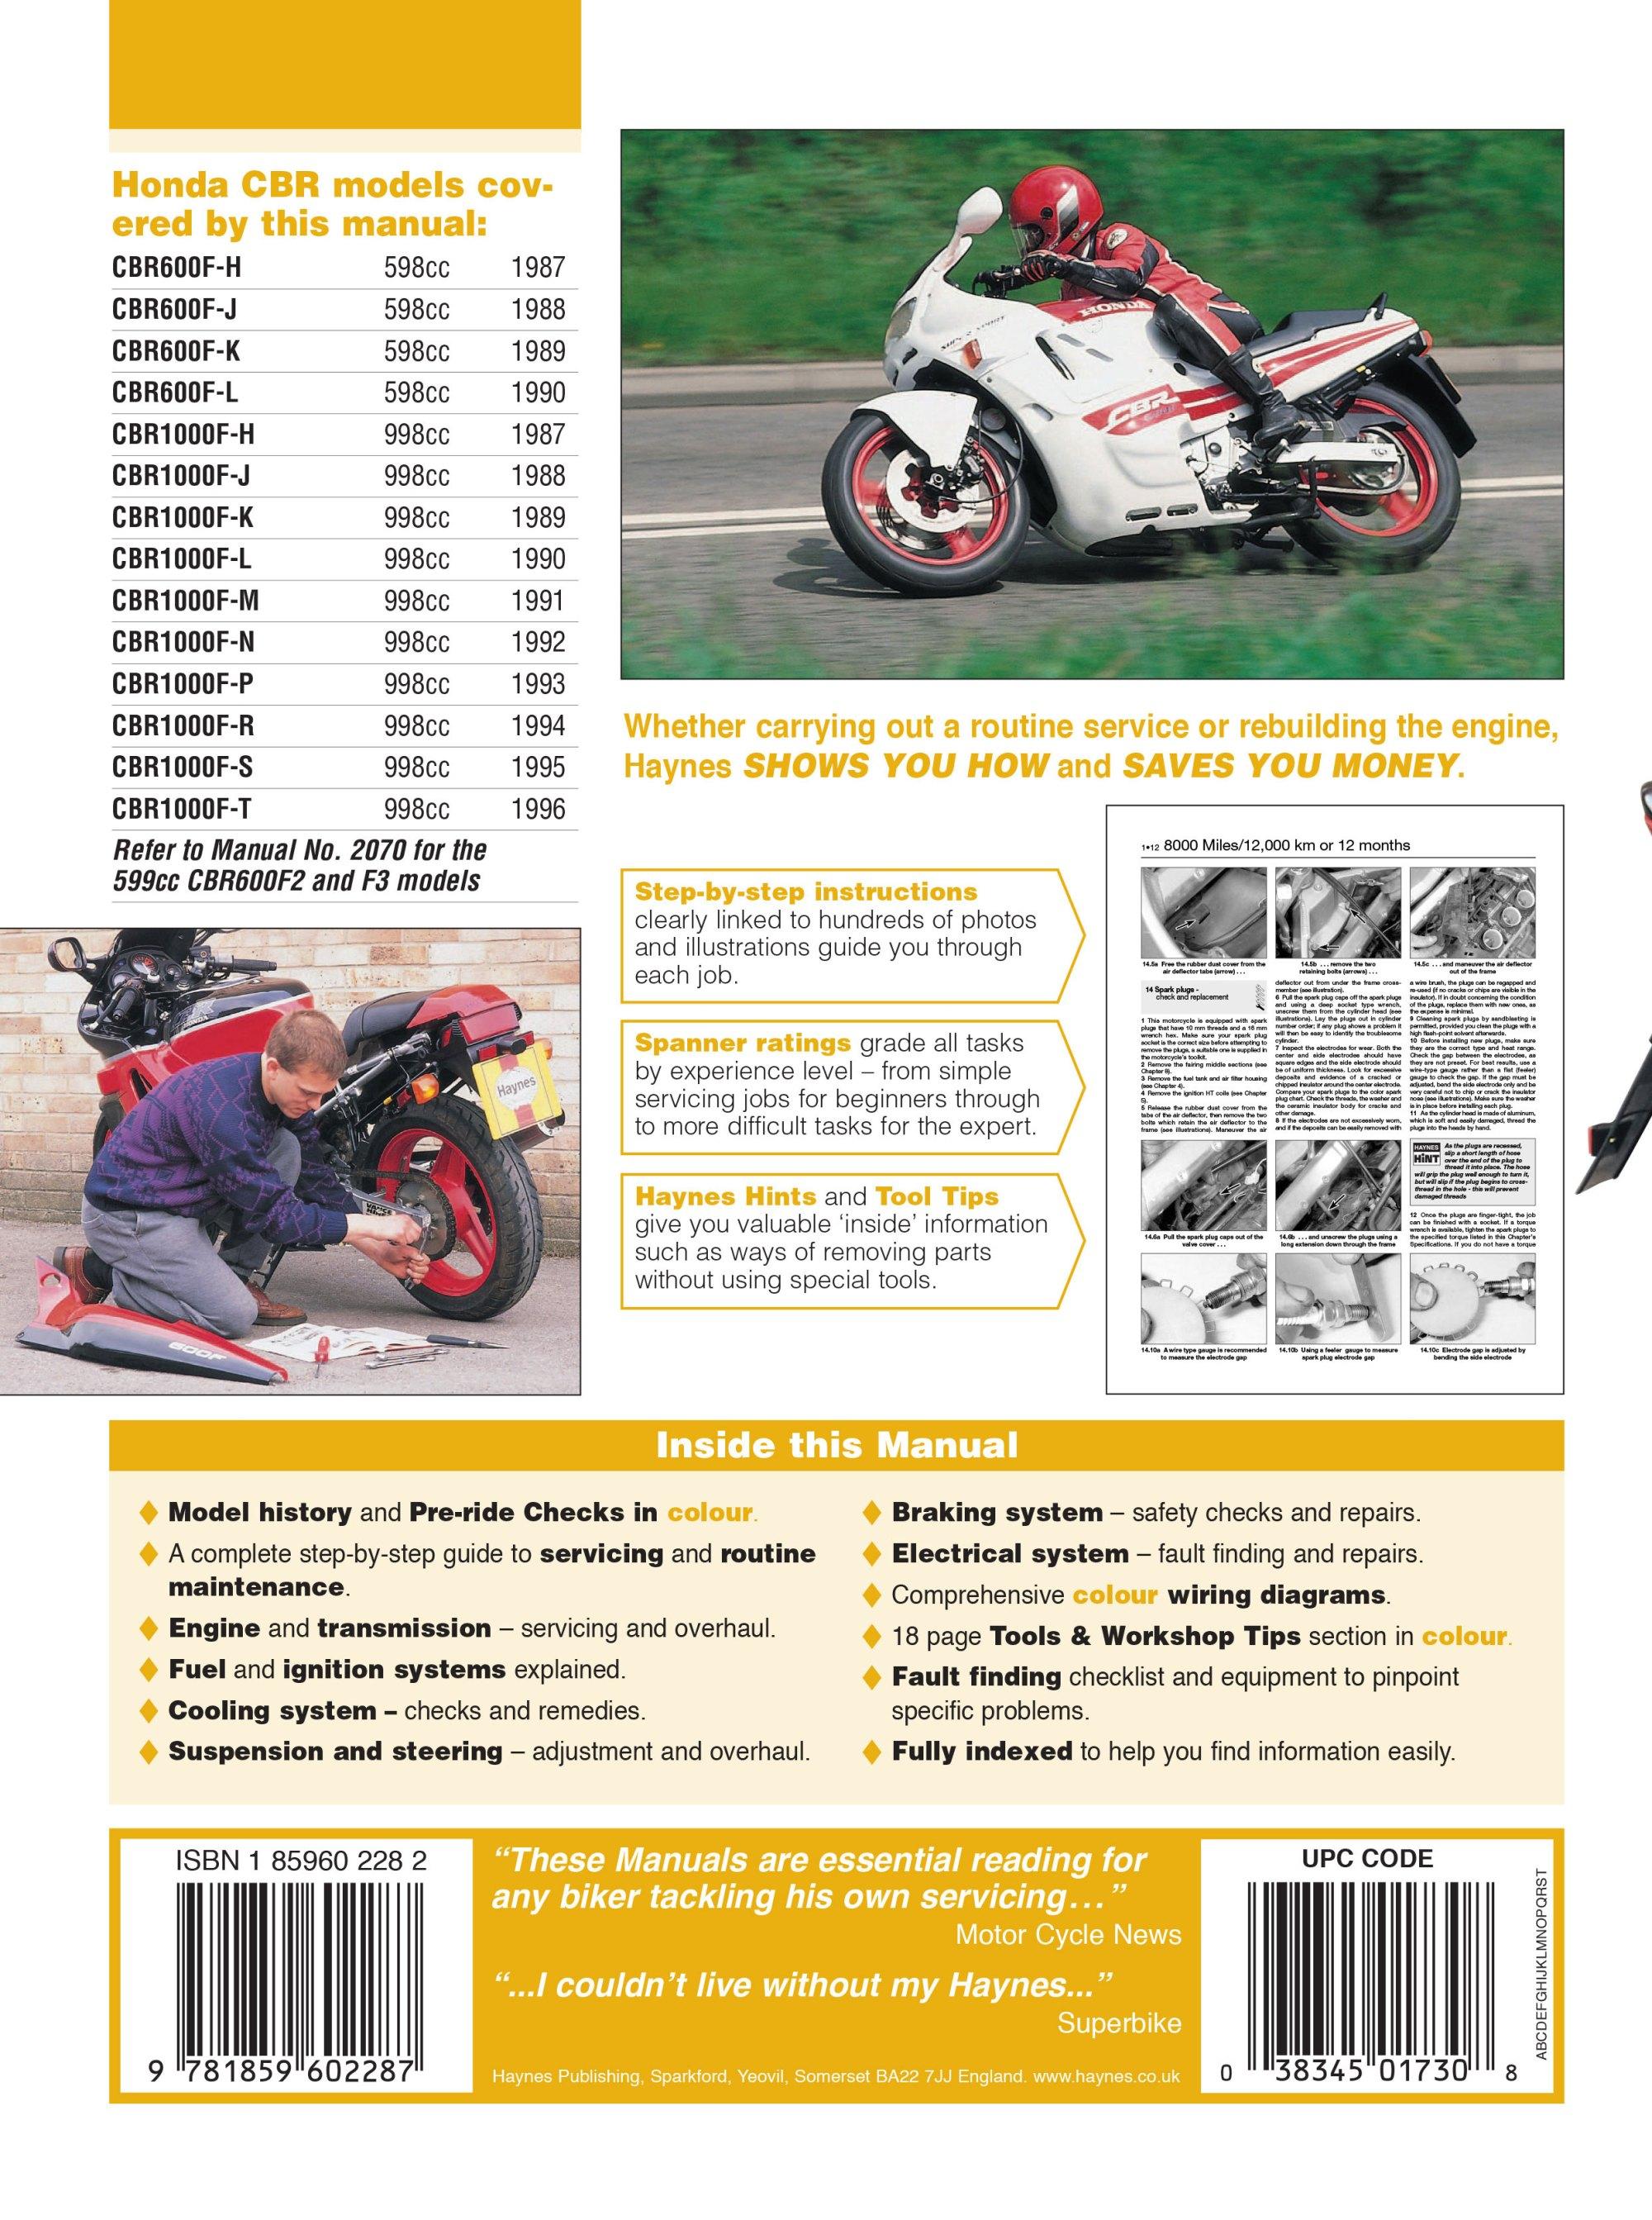 hight resolution of haynes repair manual honda cbr600 f1 cbr1000 f 598cc 998cc 1987 1996 honda cbr600f1 87 96 electrical wiring diagram